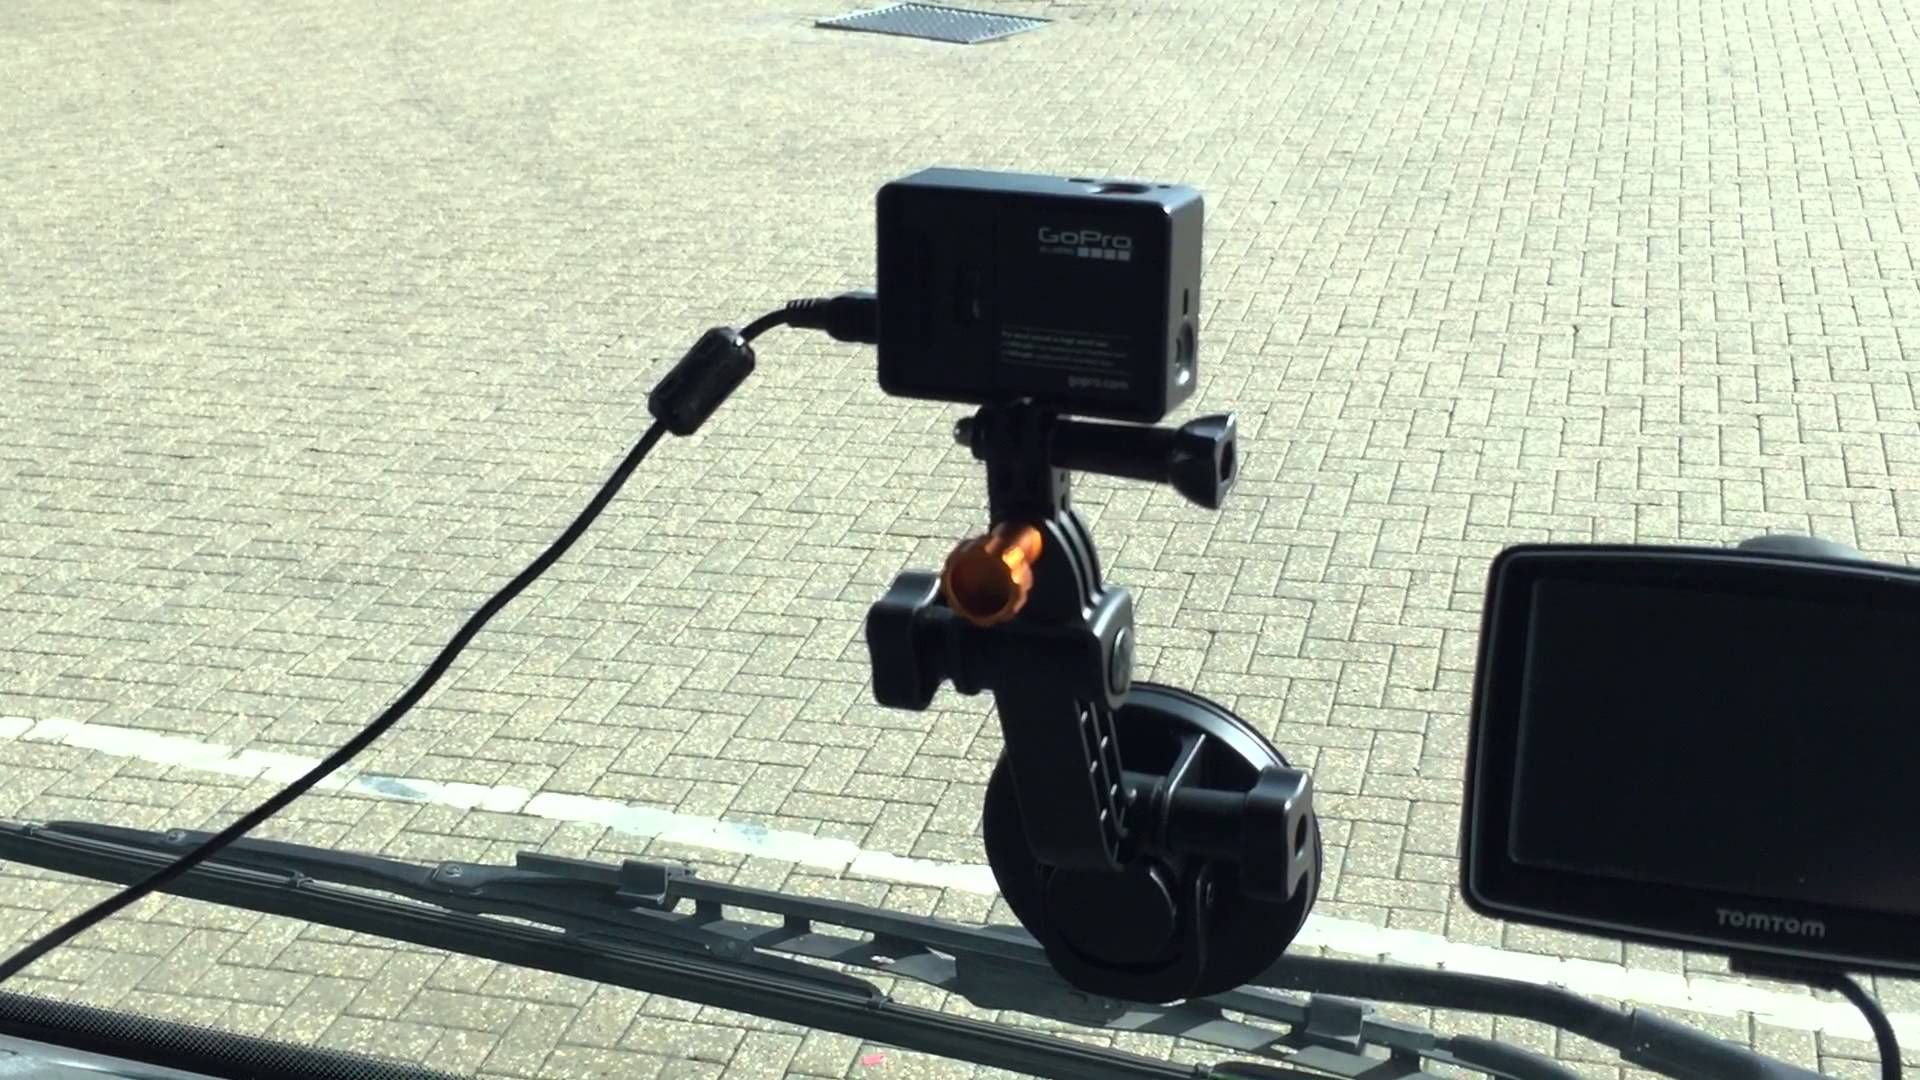 Gopro Dash Cam >> Gopro Hero 3 As A Dash Cam Gopro As A Dash Cam In My Truck